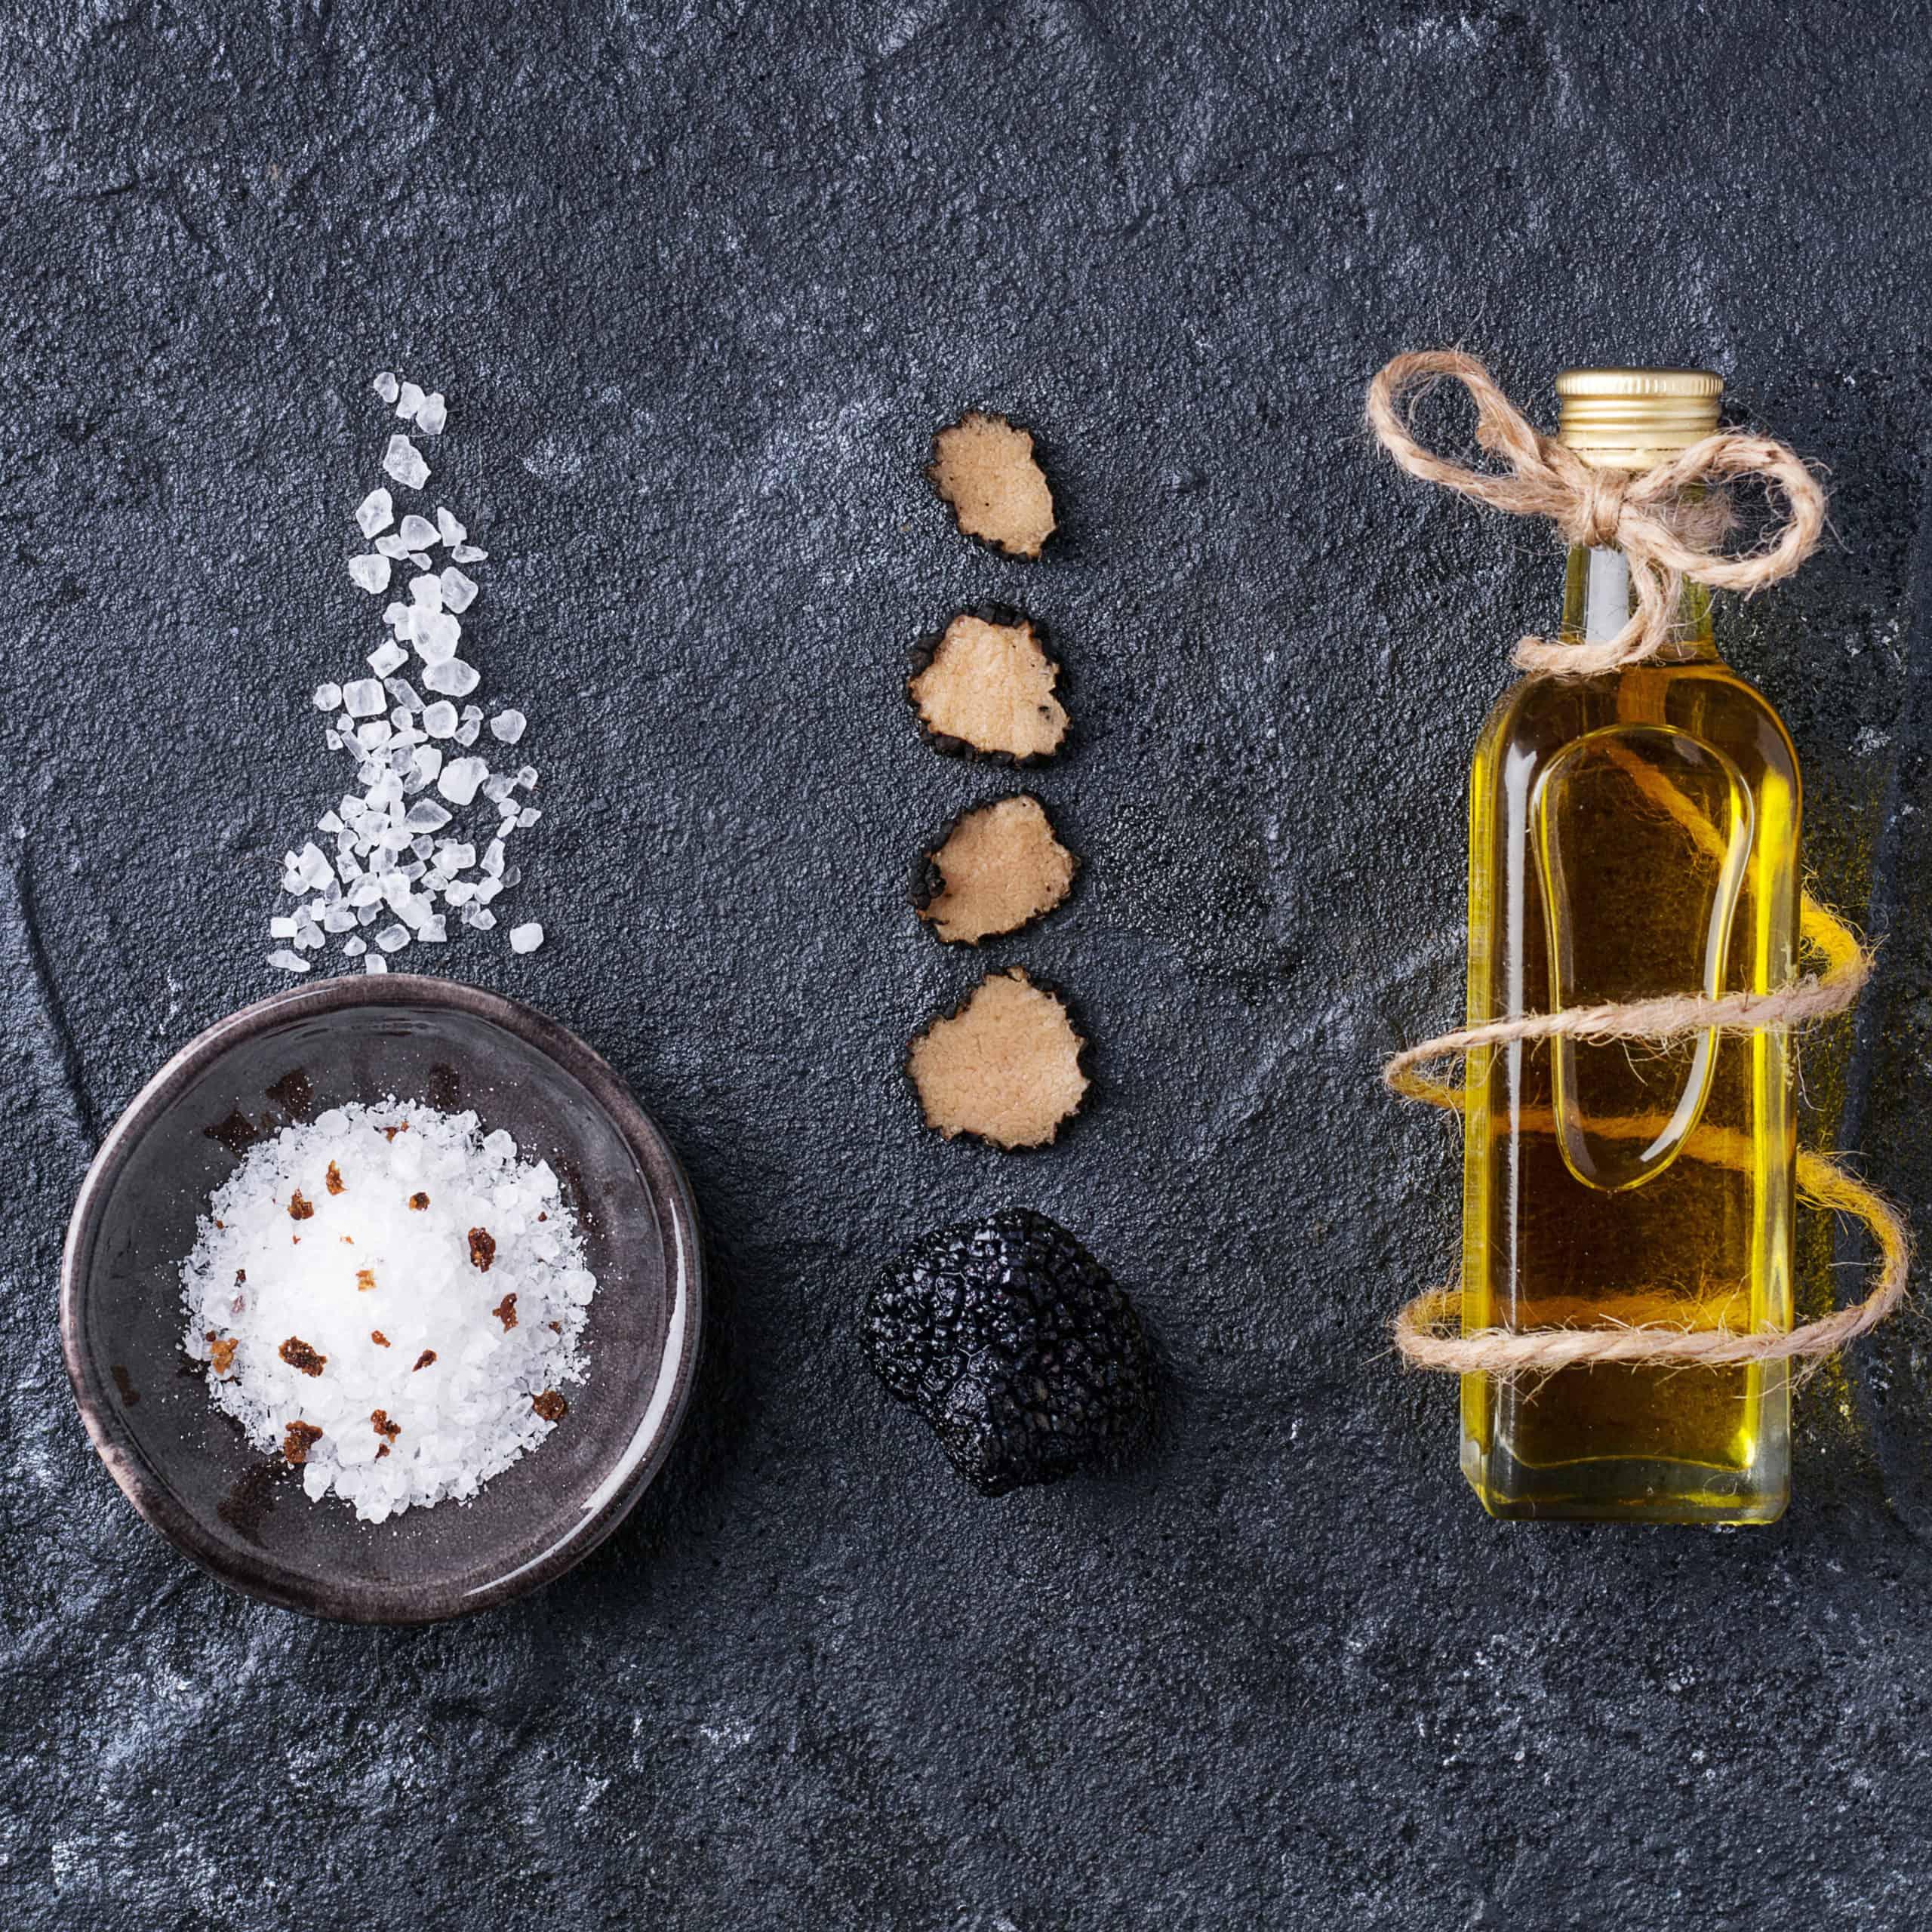 black truffle salt, best truffle salt, what is truffle salt, uses for truffle salt, truffle salt uses